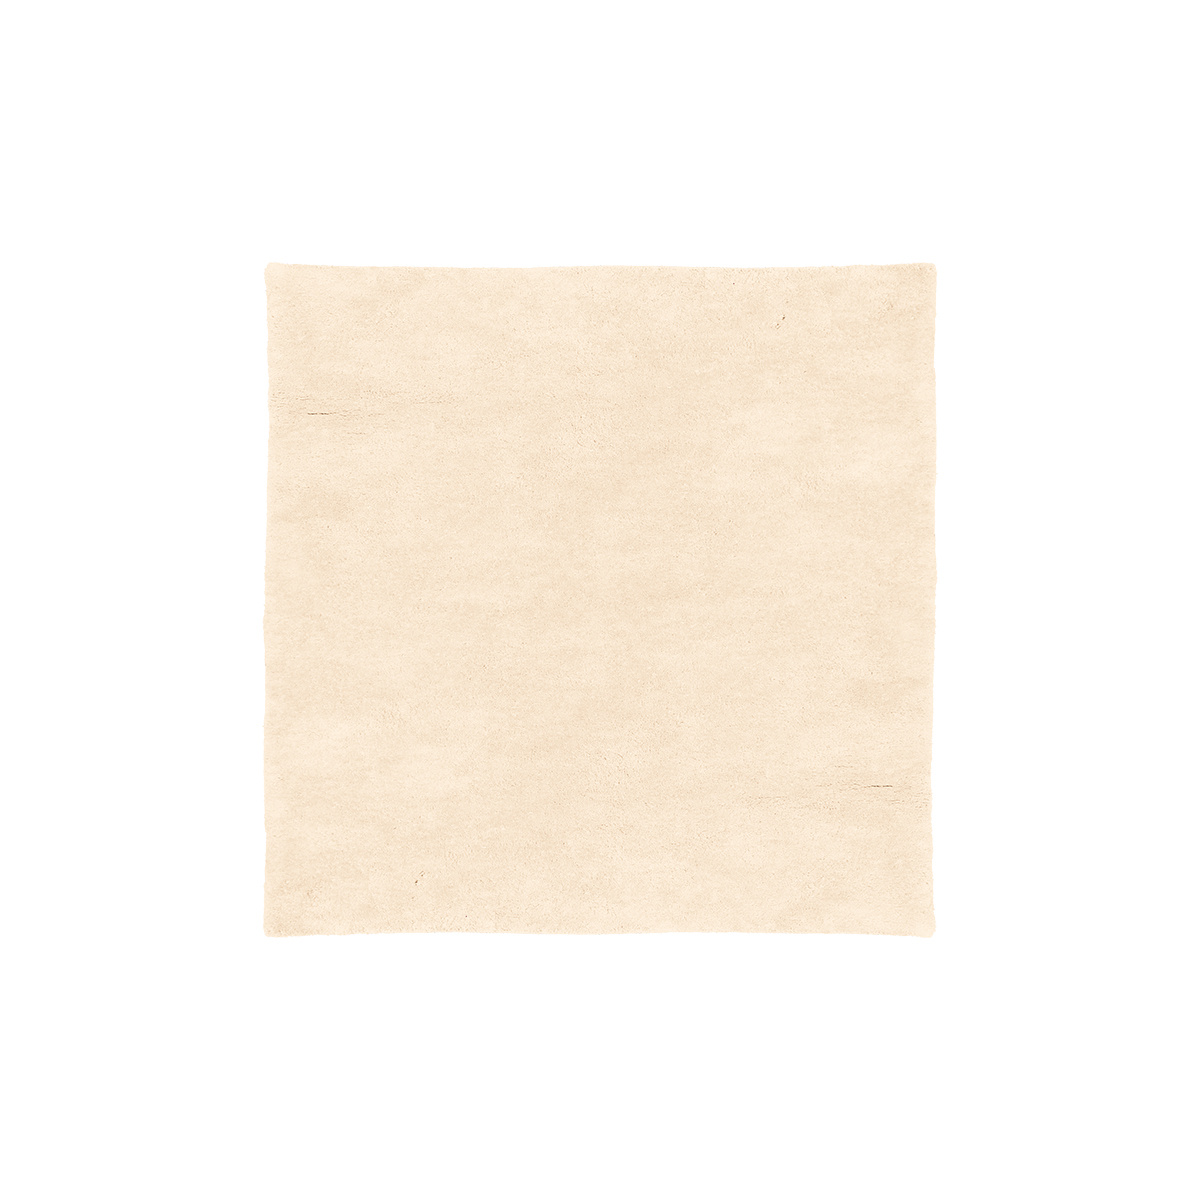 Tapis Velluto blanc cassé 200 x 200